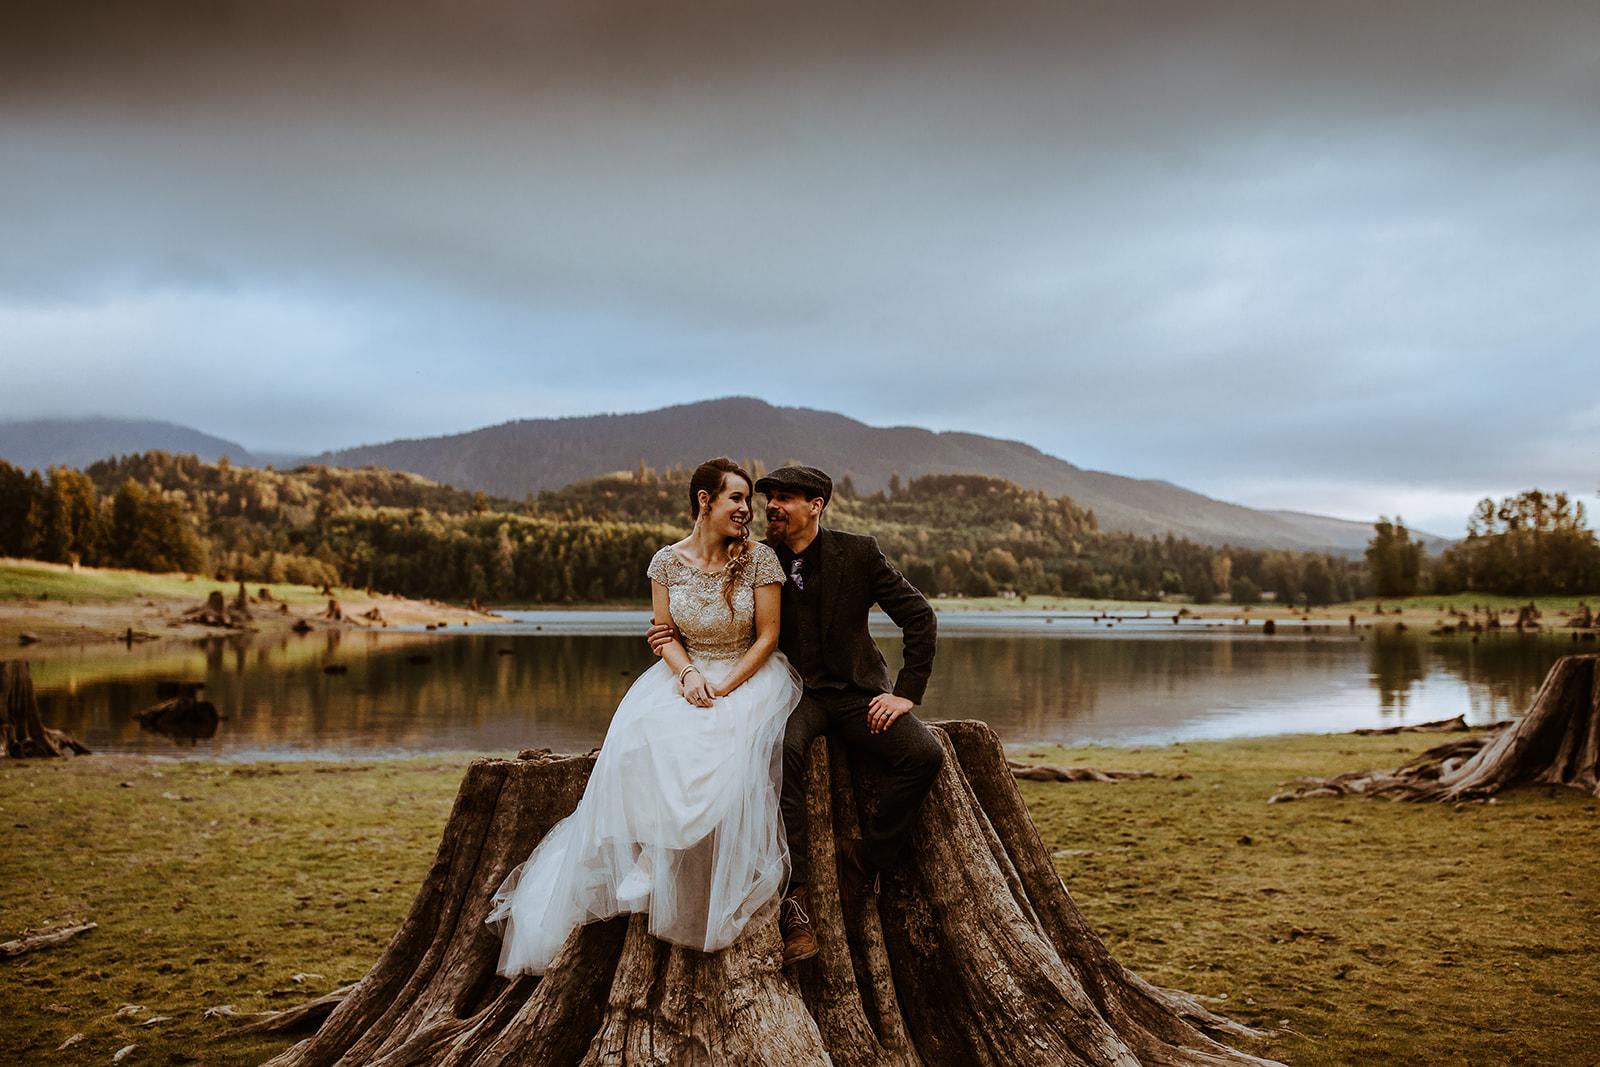 mount-rainier-cabin-elopement-megan-gallagher-photography_(485_of_568).jpg